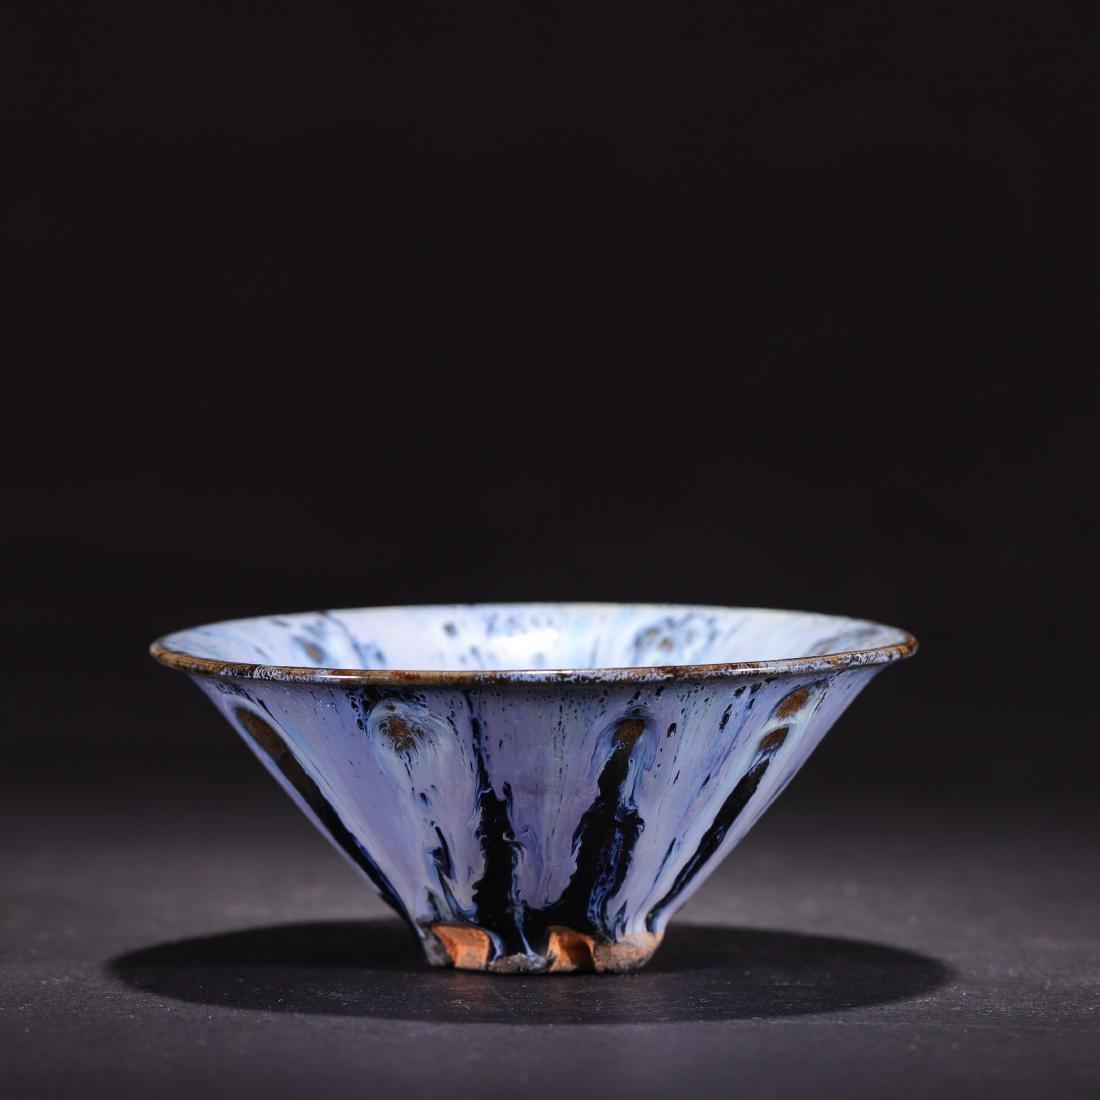 A Kiln-Glaze Blue Conical Tea Bowl